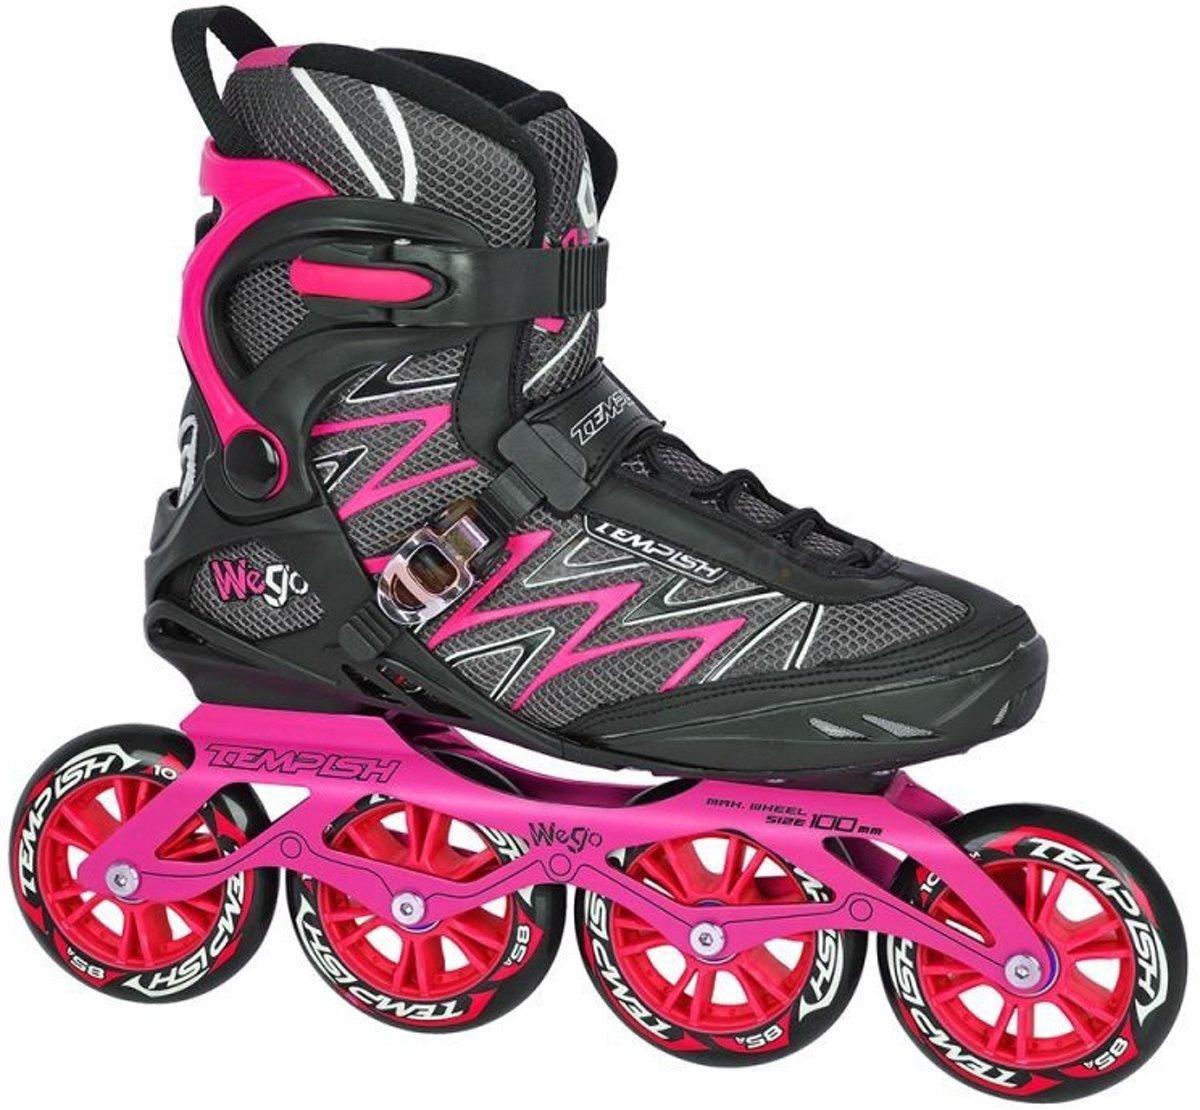 c0748661638 bol.com | Tempish Inline Skates We-go 100 Dames Zwart/roze Maat 39